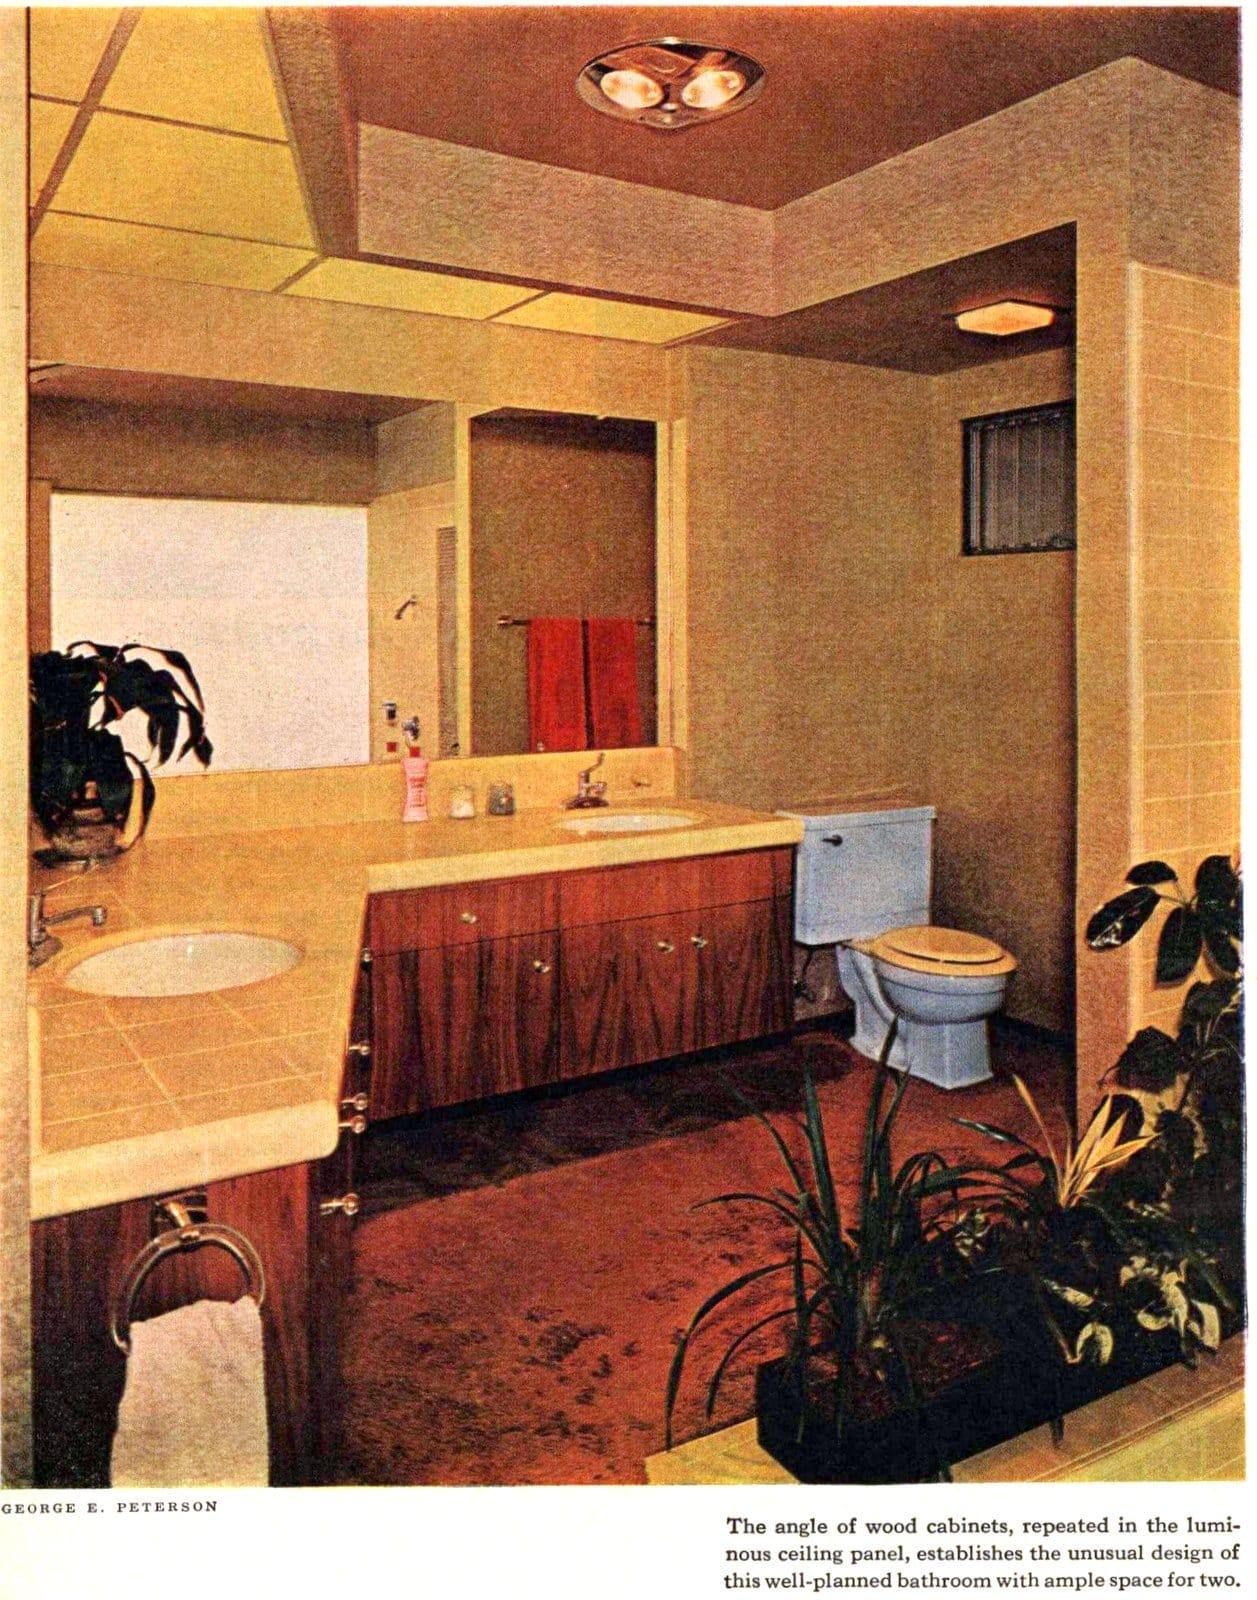 Angled bathroom design (1962)